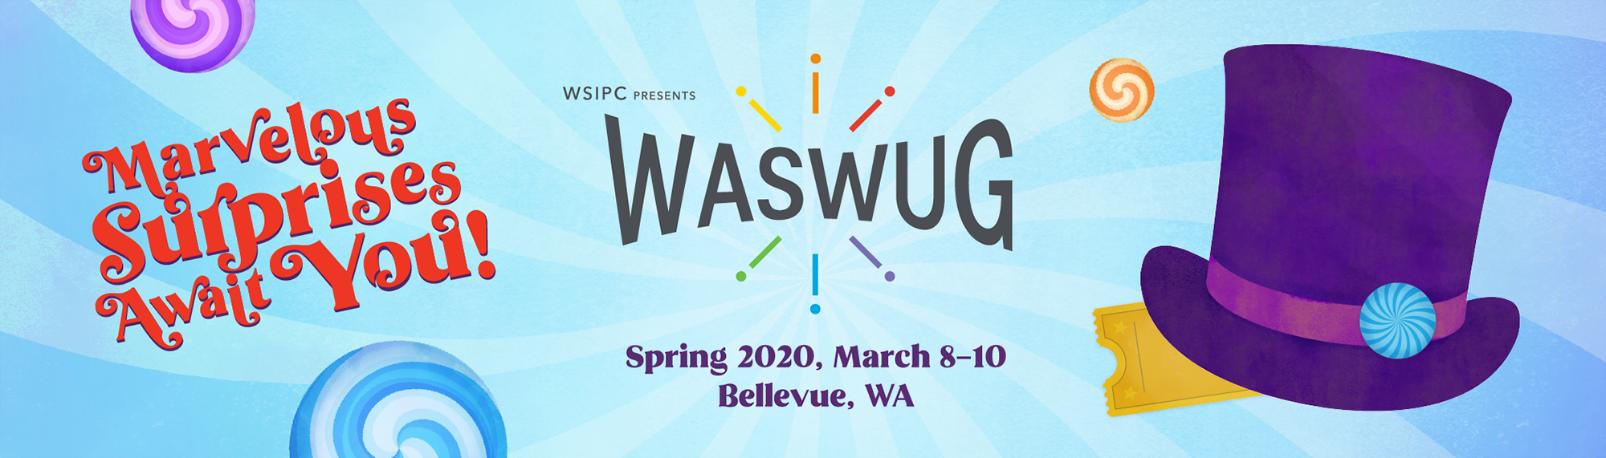 WASWUG Flyer